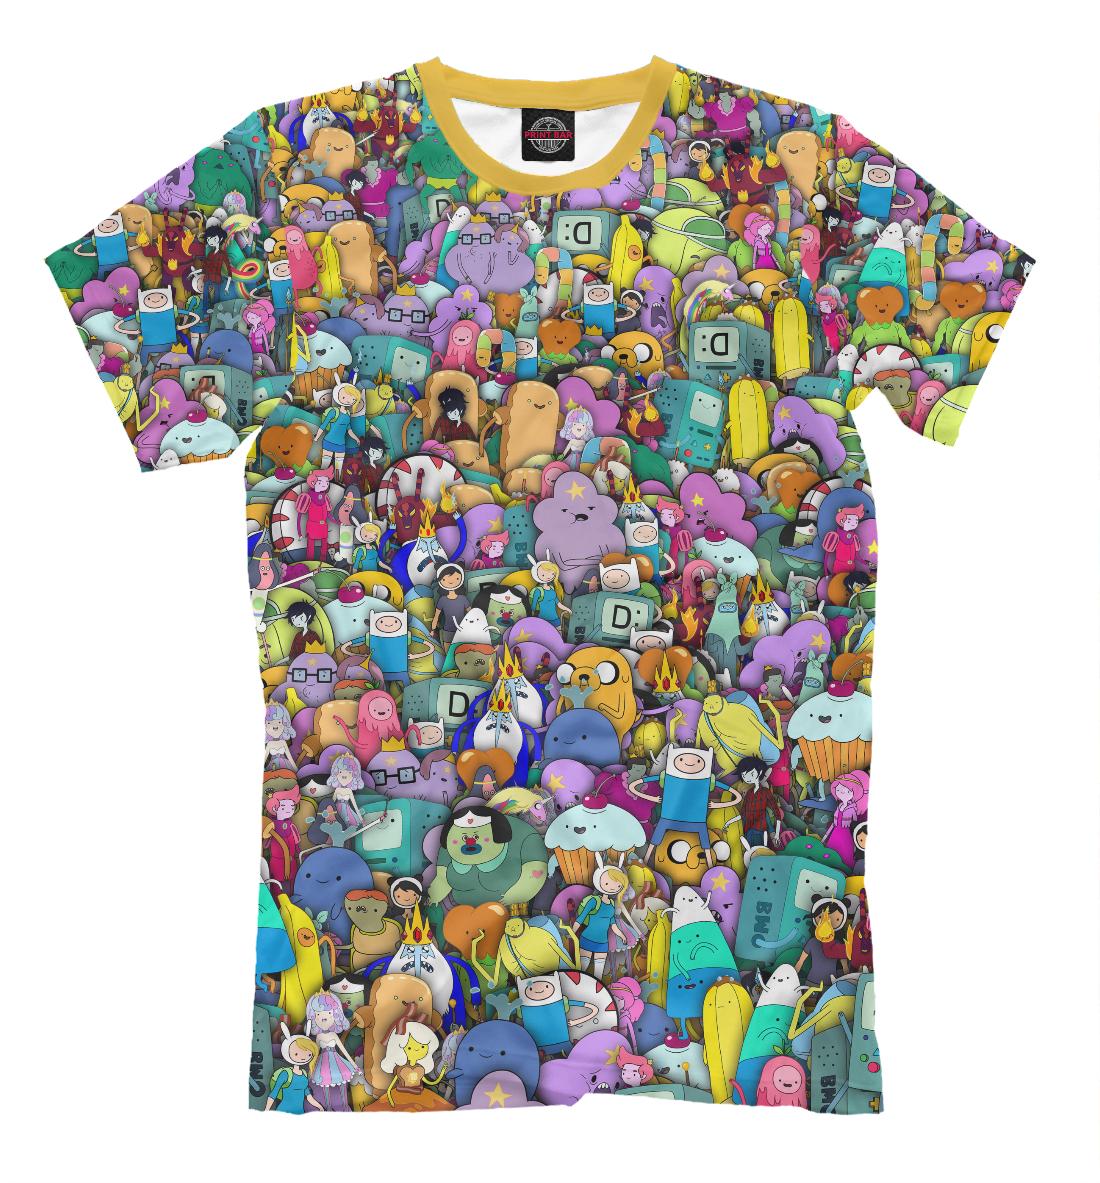 Купить Adventure Time. Стикербомбинг, Printbar, Футболки, ADV-750144-fut-2